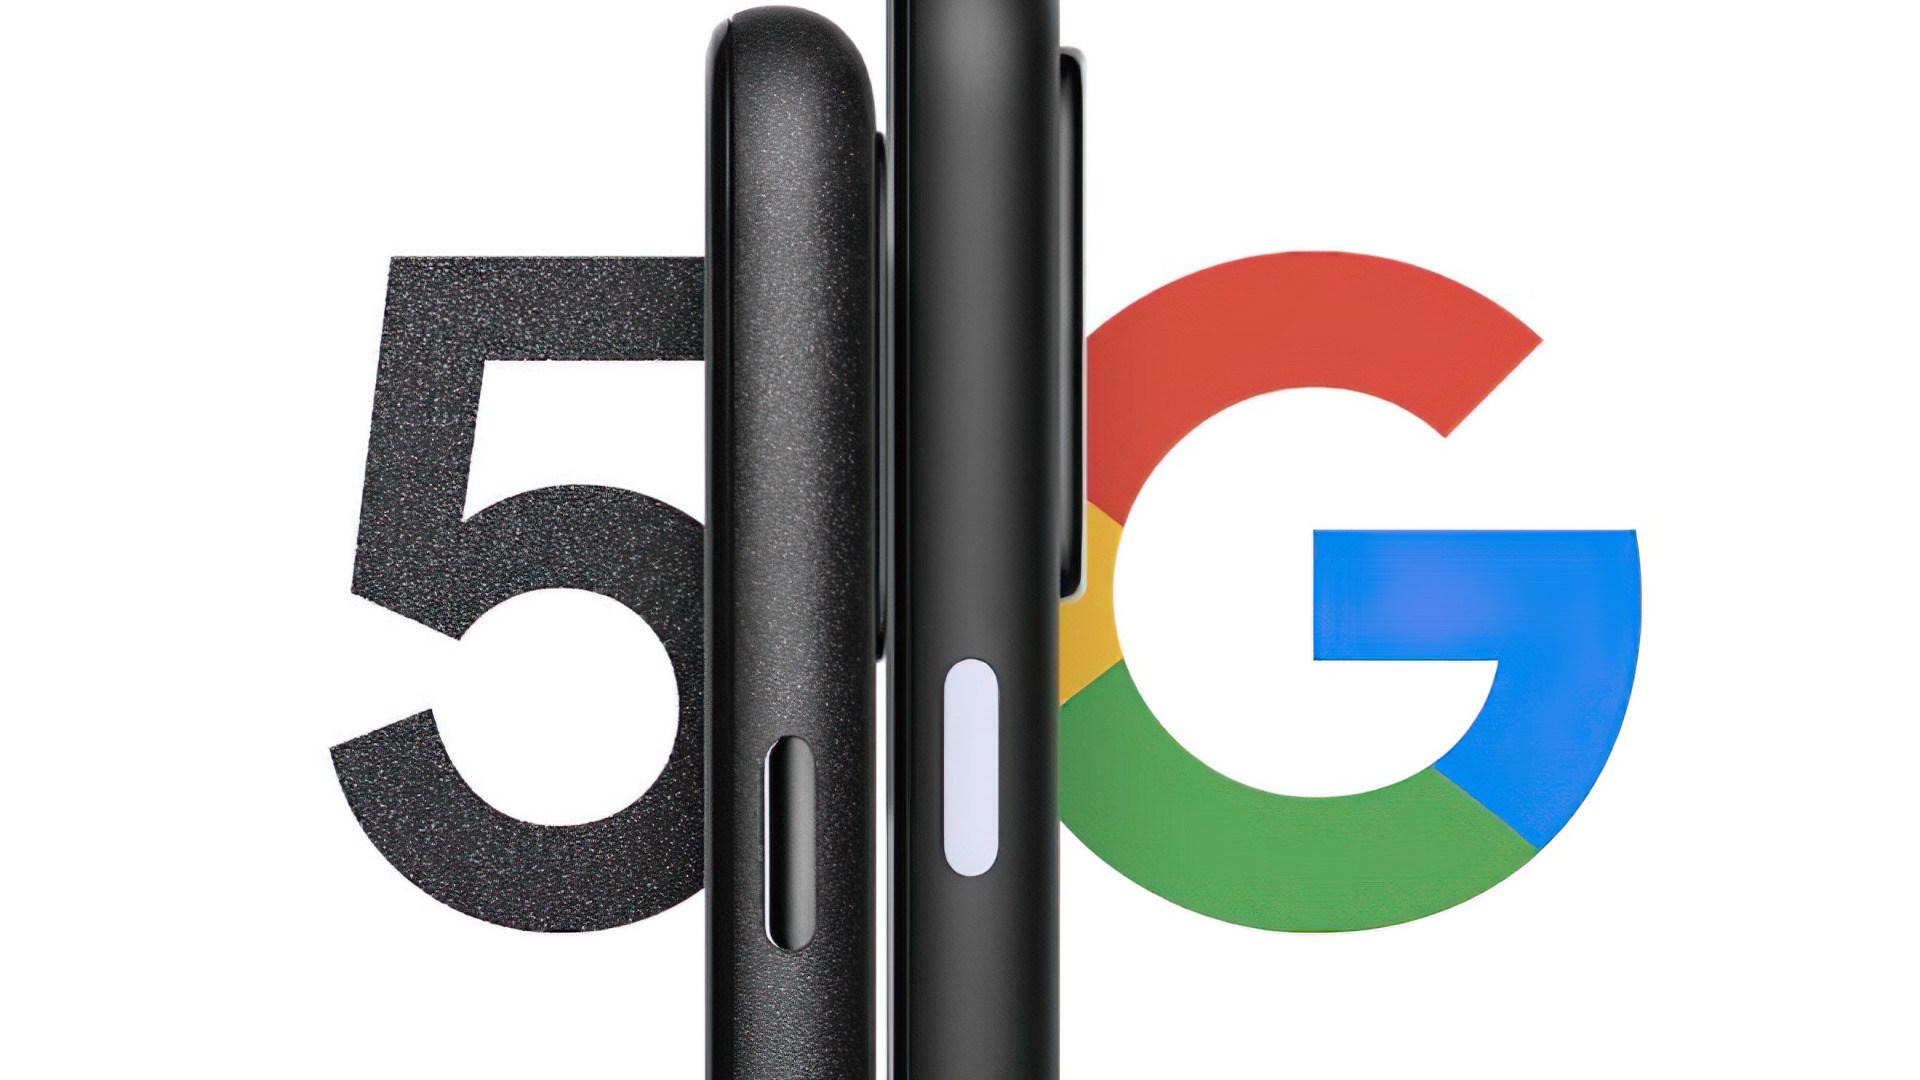 Smartphone, 5G, Pixel, Google Pixel, Google Pixel 5, Pixel 5, Google Pixel 4a 5G